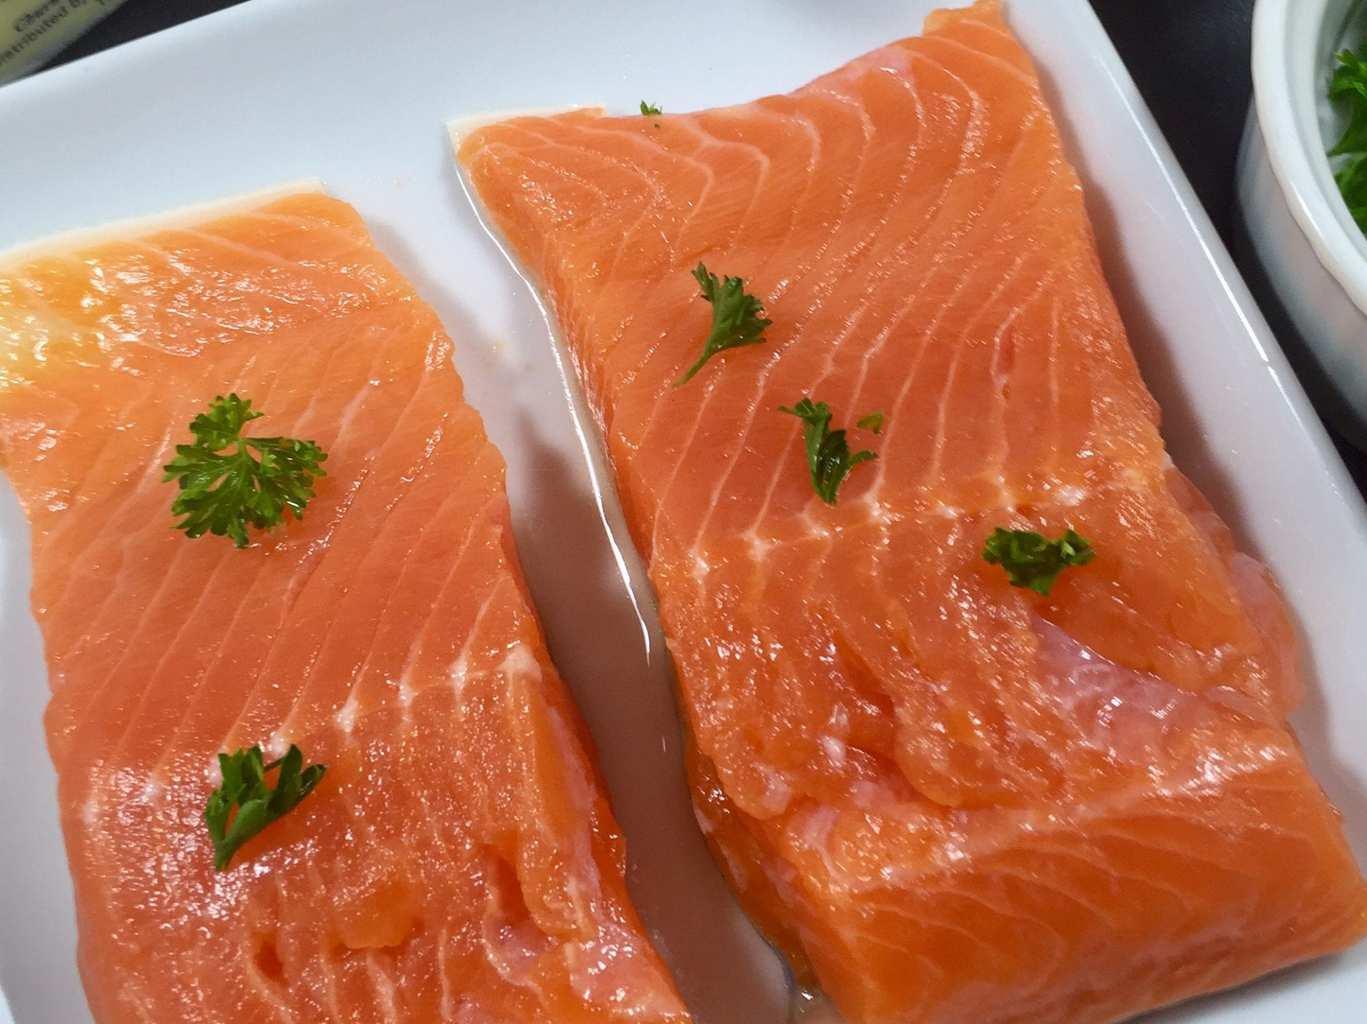 Fresh salmon on a white plate